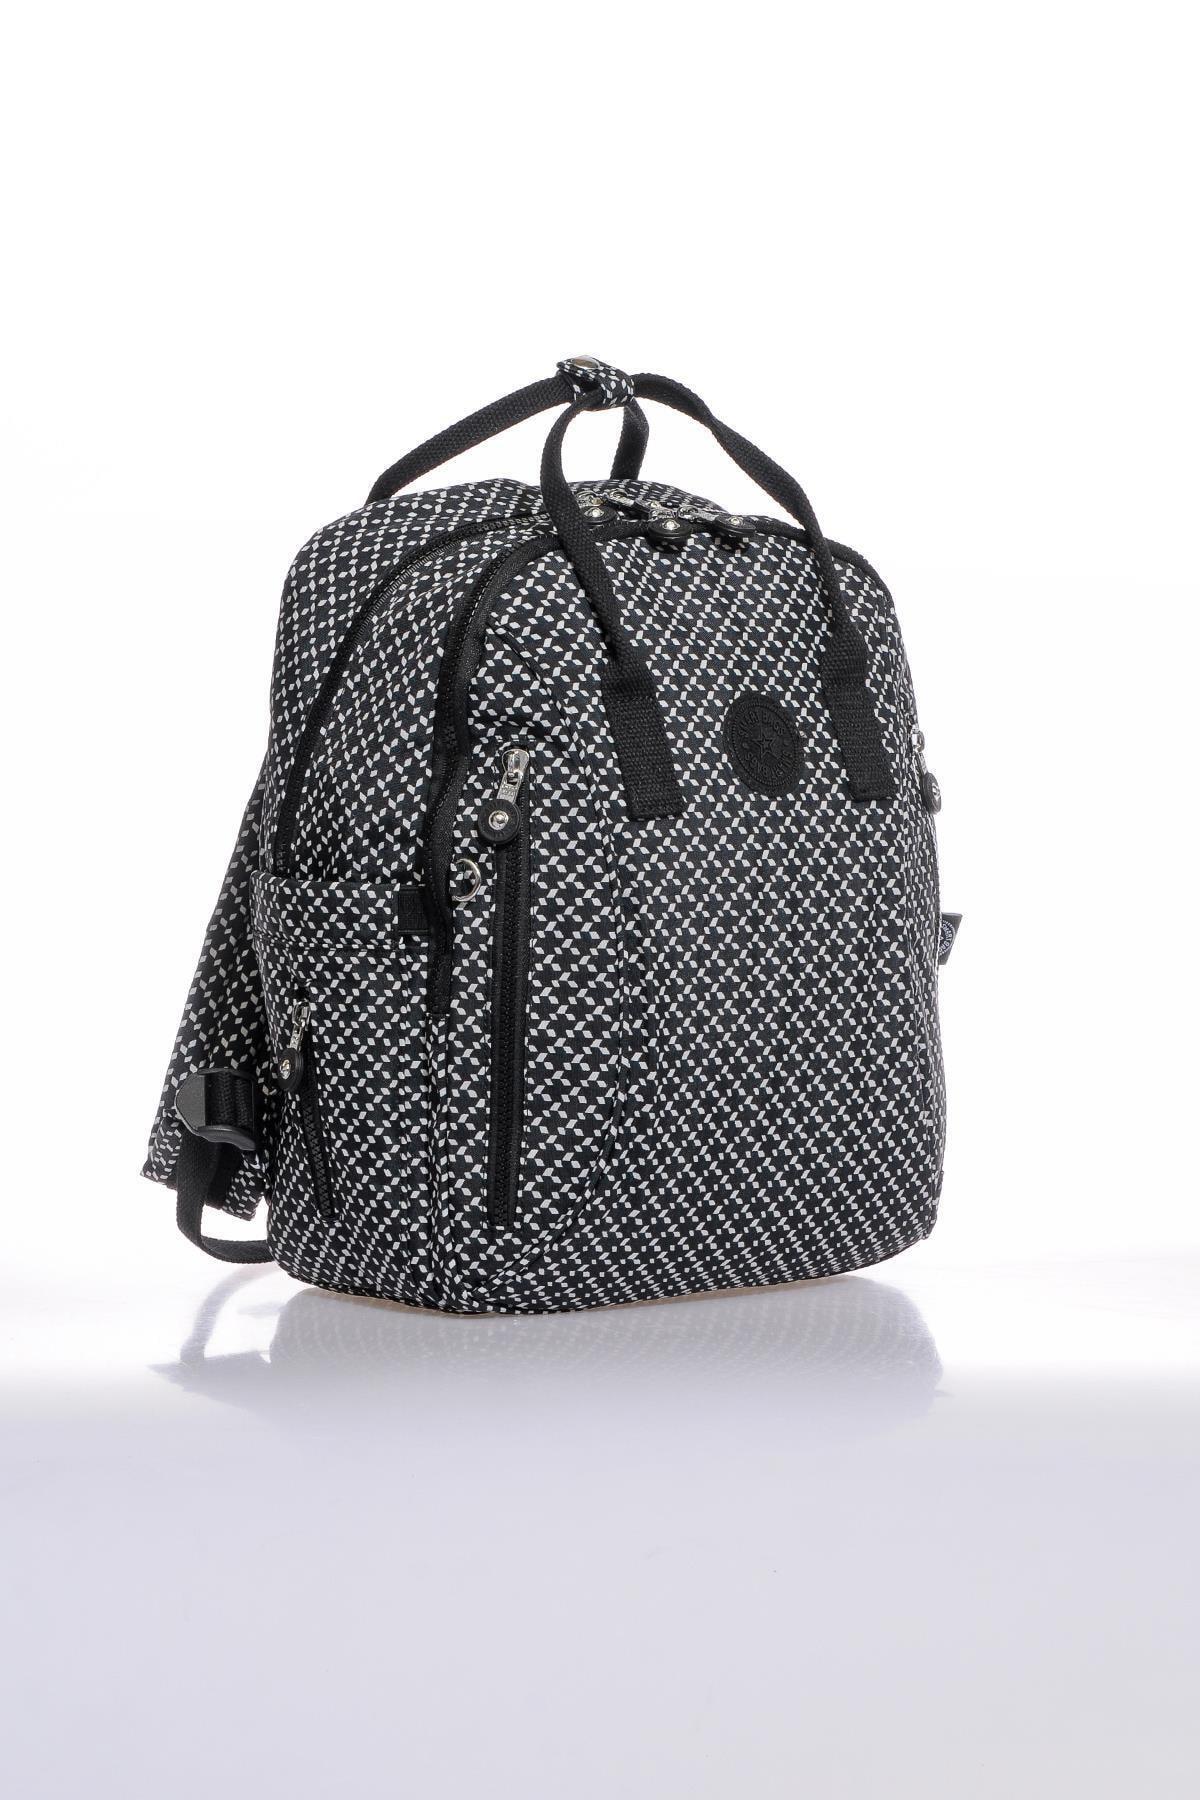 SMART BAGS Smb1220-0127 Siyah/beyaz Kadın Sırt Çantası 2